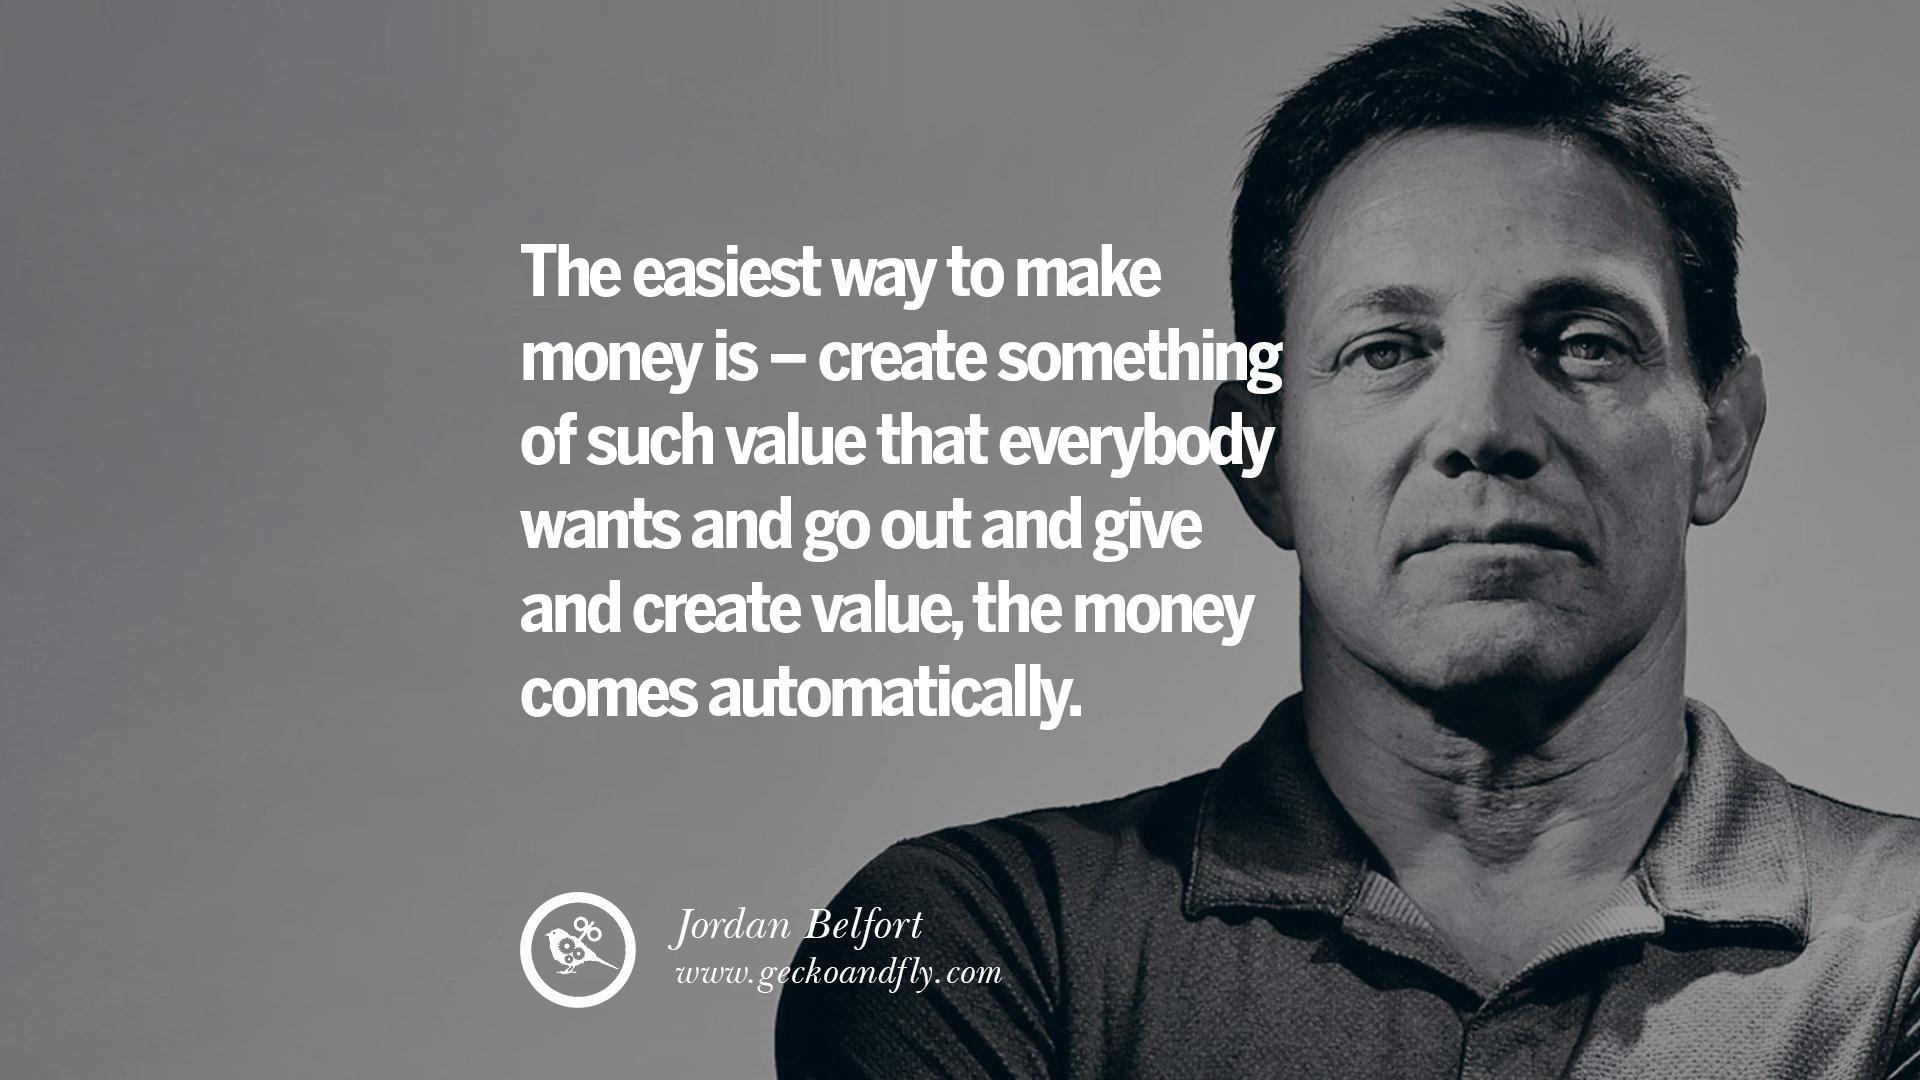 Wolf Of Wall Street Quote Iphone Wallpaper Jordan Belfort Quotes Quotesgram